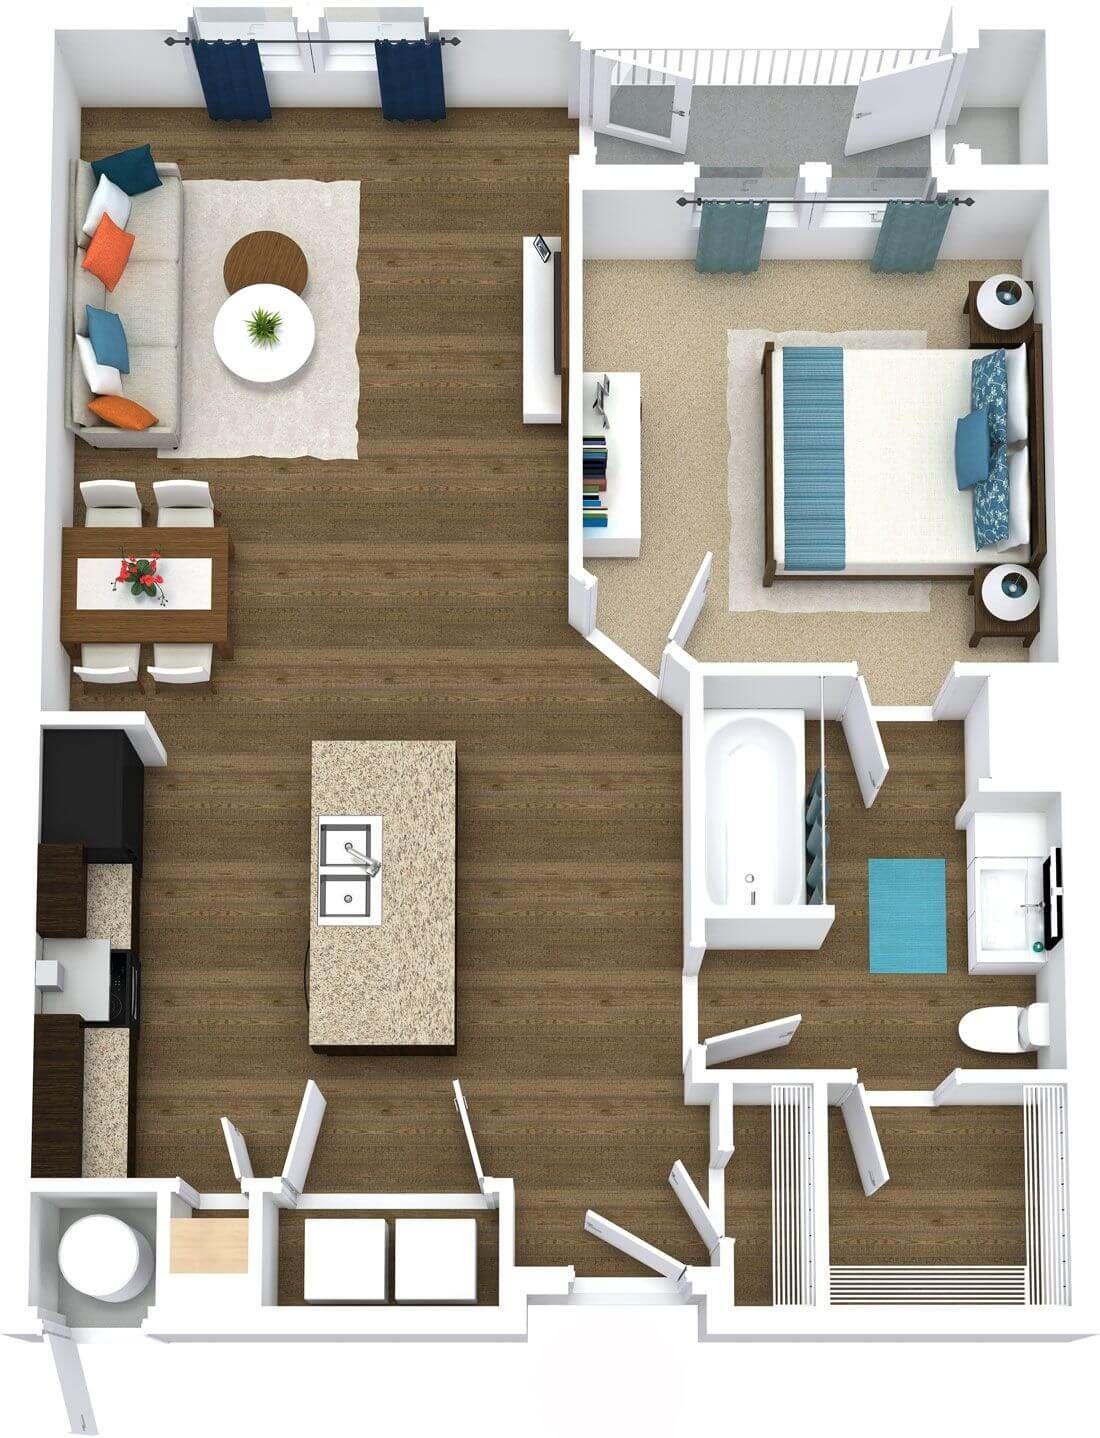 Townhome Floor Plans Google Search Floor Plans House Floor Plans Dream House Plans